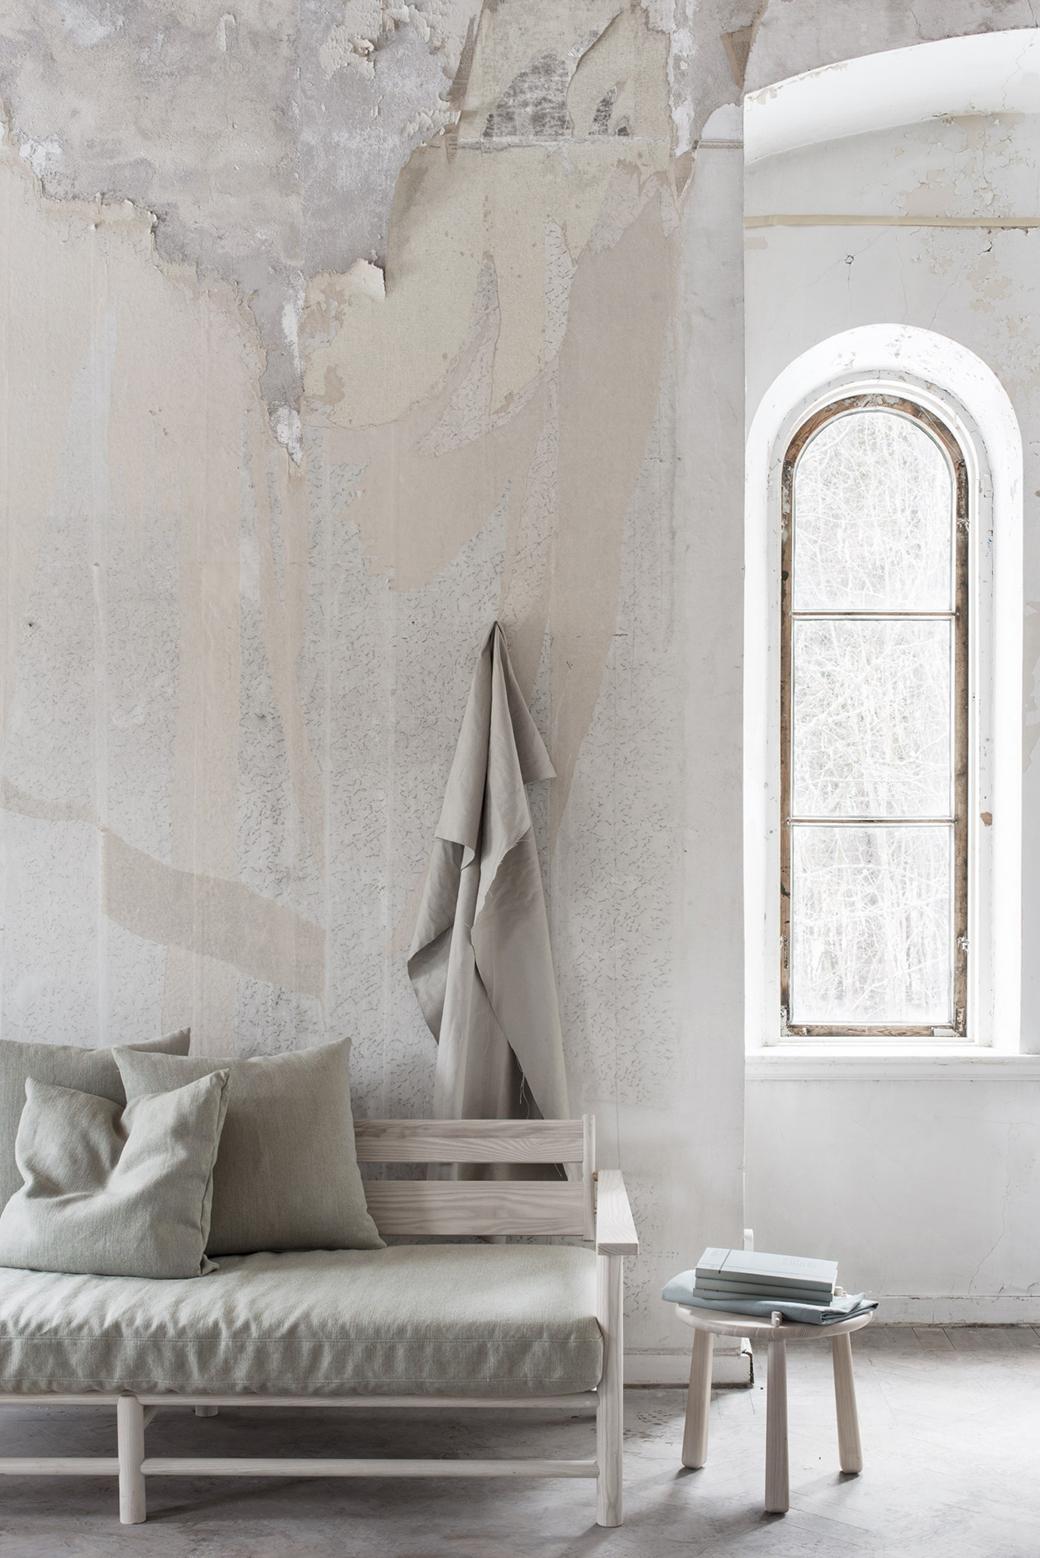 Hanna sofa by Emma Olbers